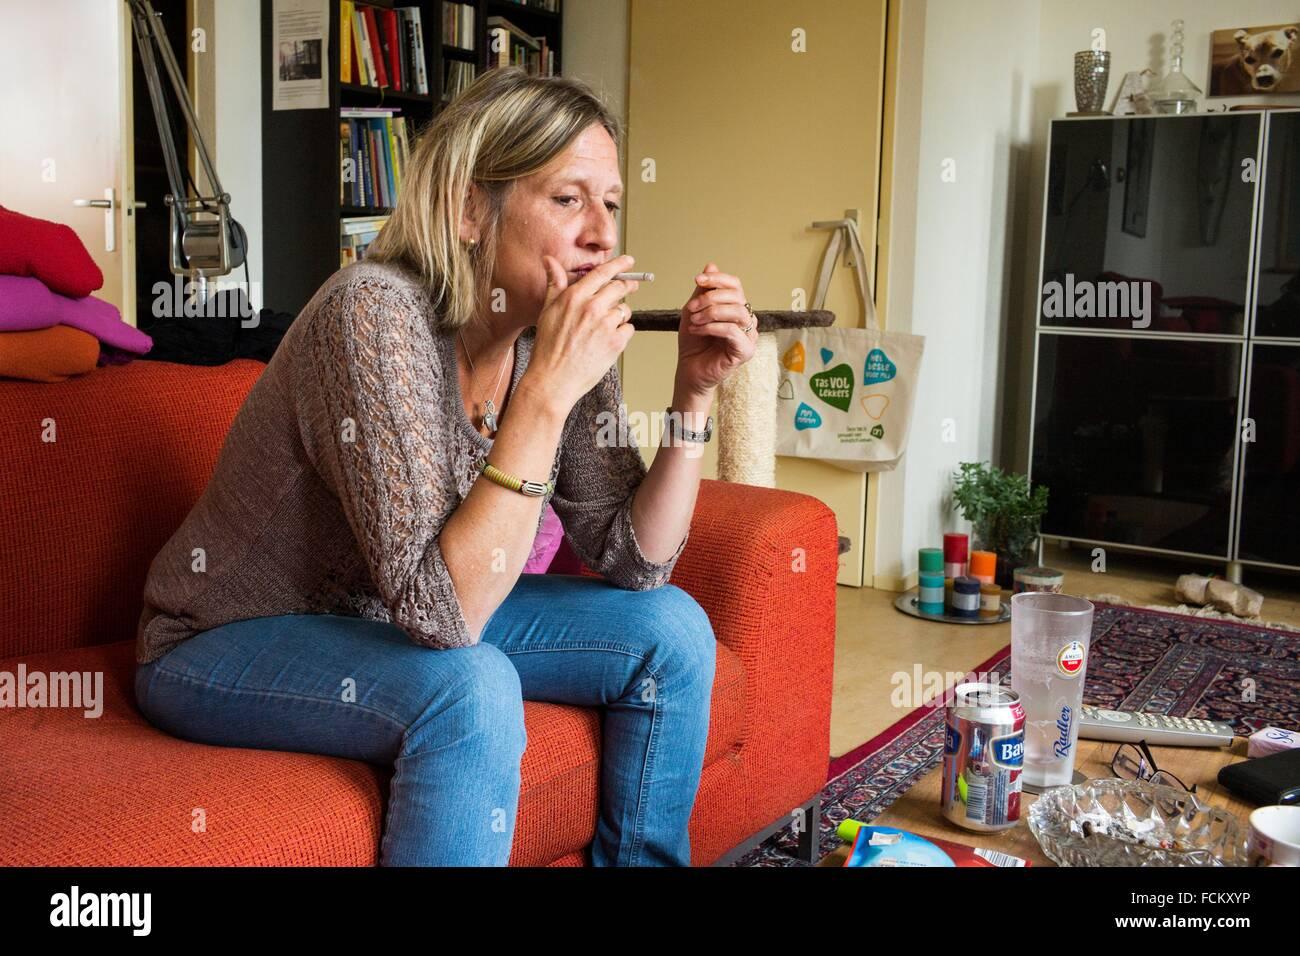 Jennifer cowan thumbs